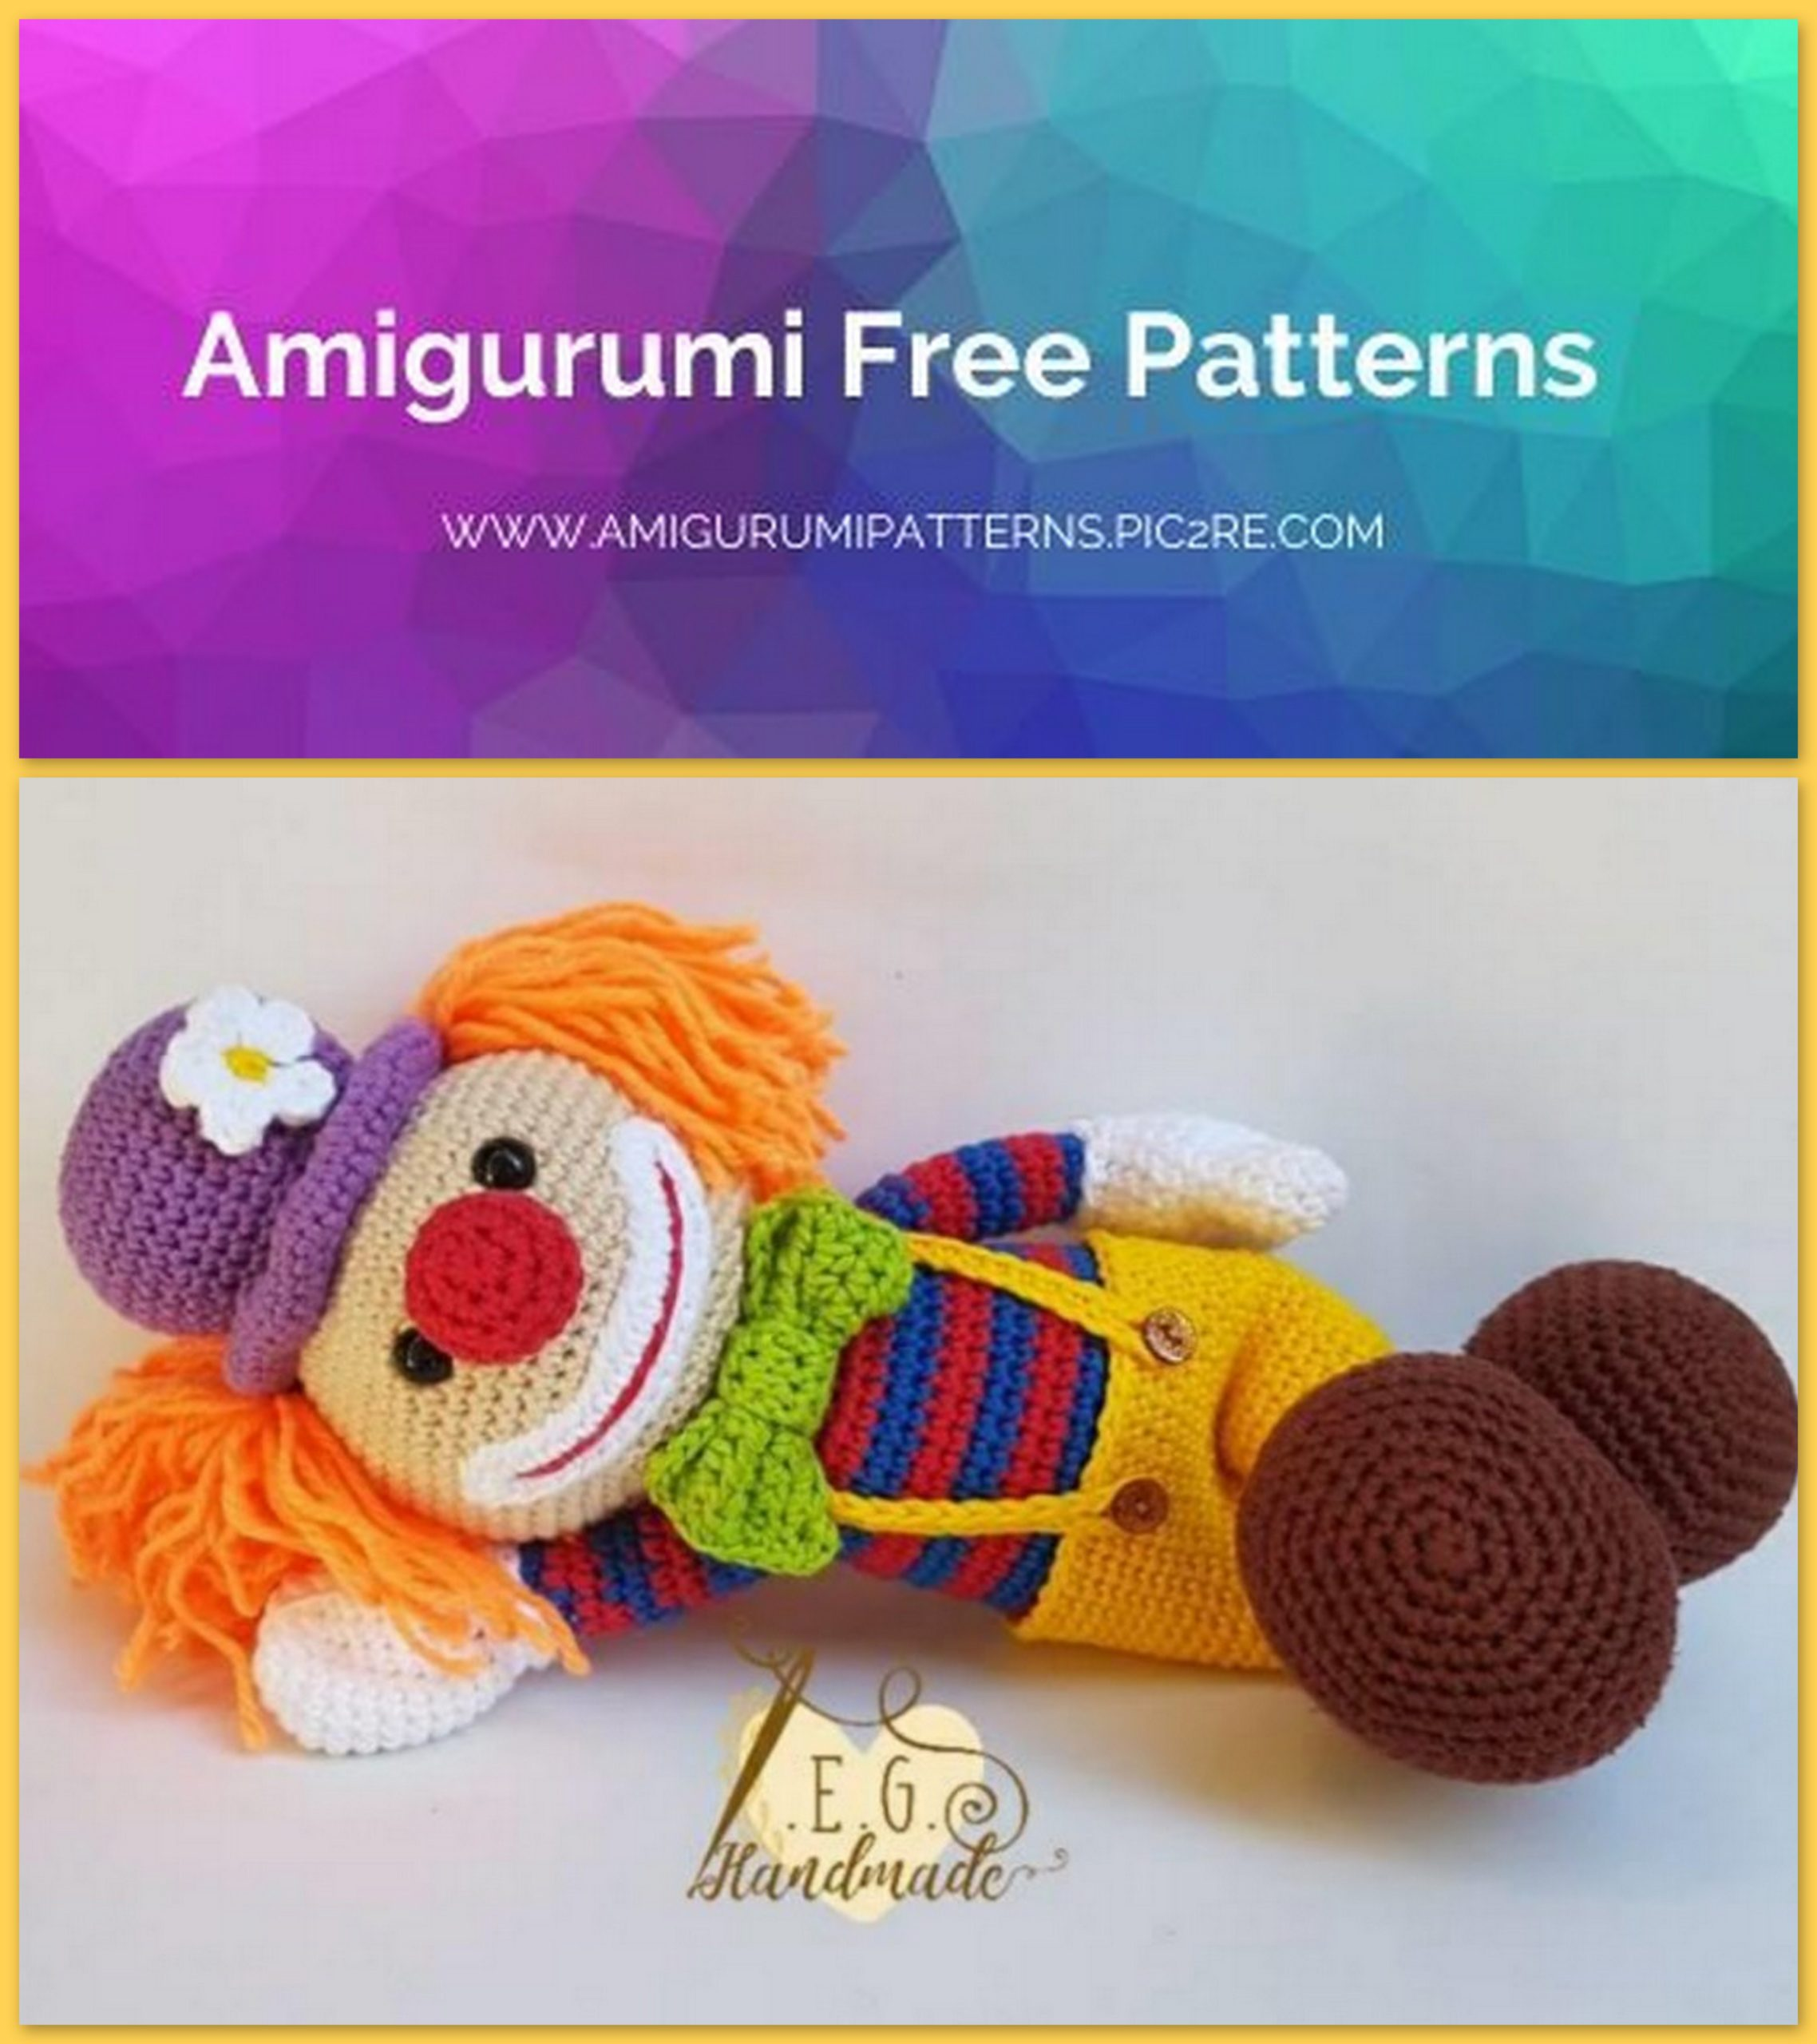 Pink Little Lady Amigurumi Crochet Pattern by Sayjai ... | 2560x2276